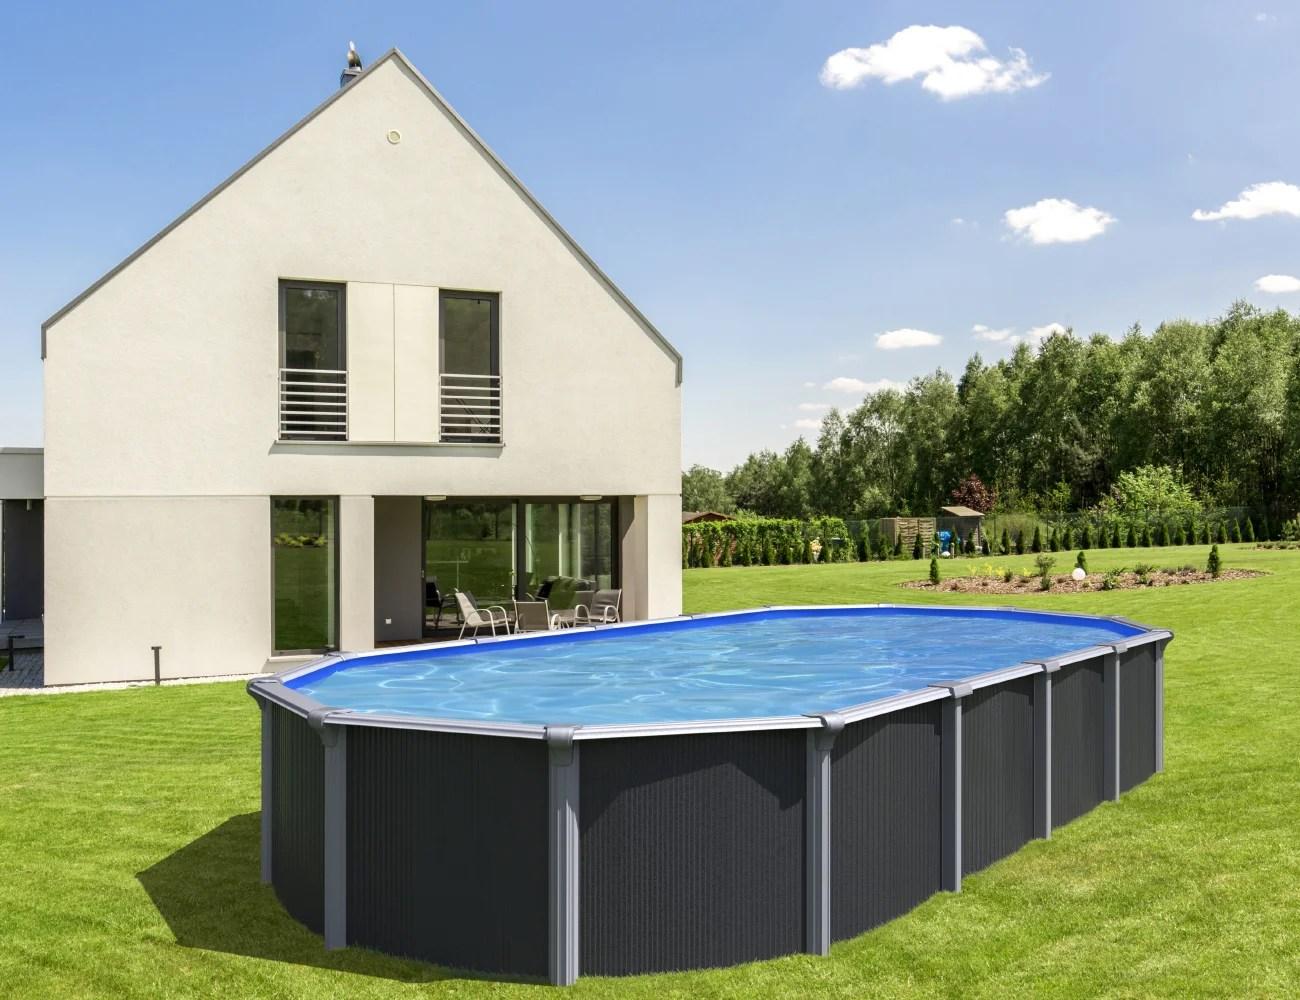 piscine osmose trigano ovale x l de 5 a 7